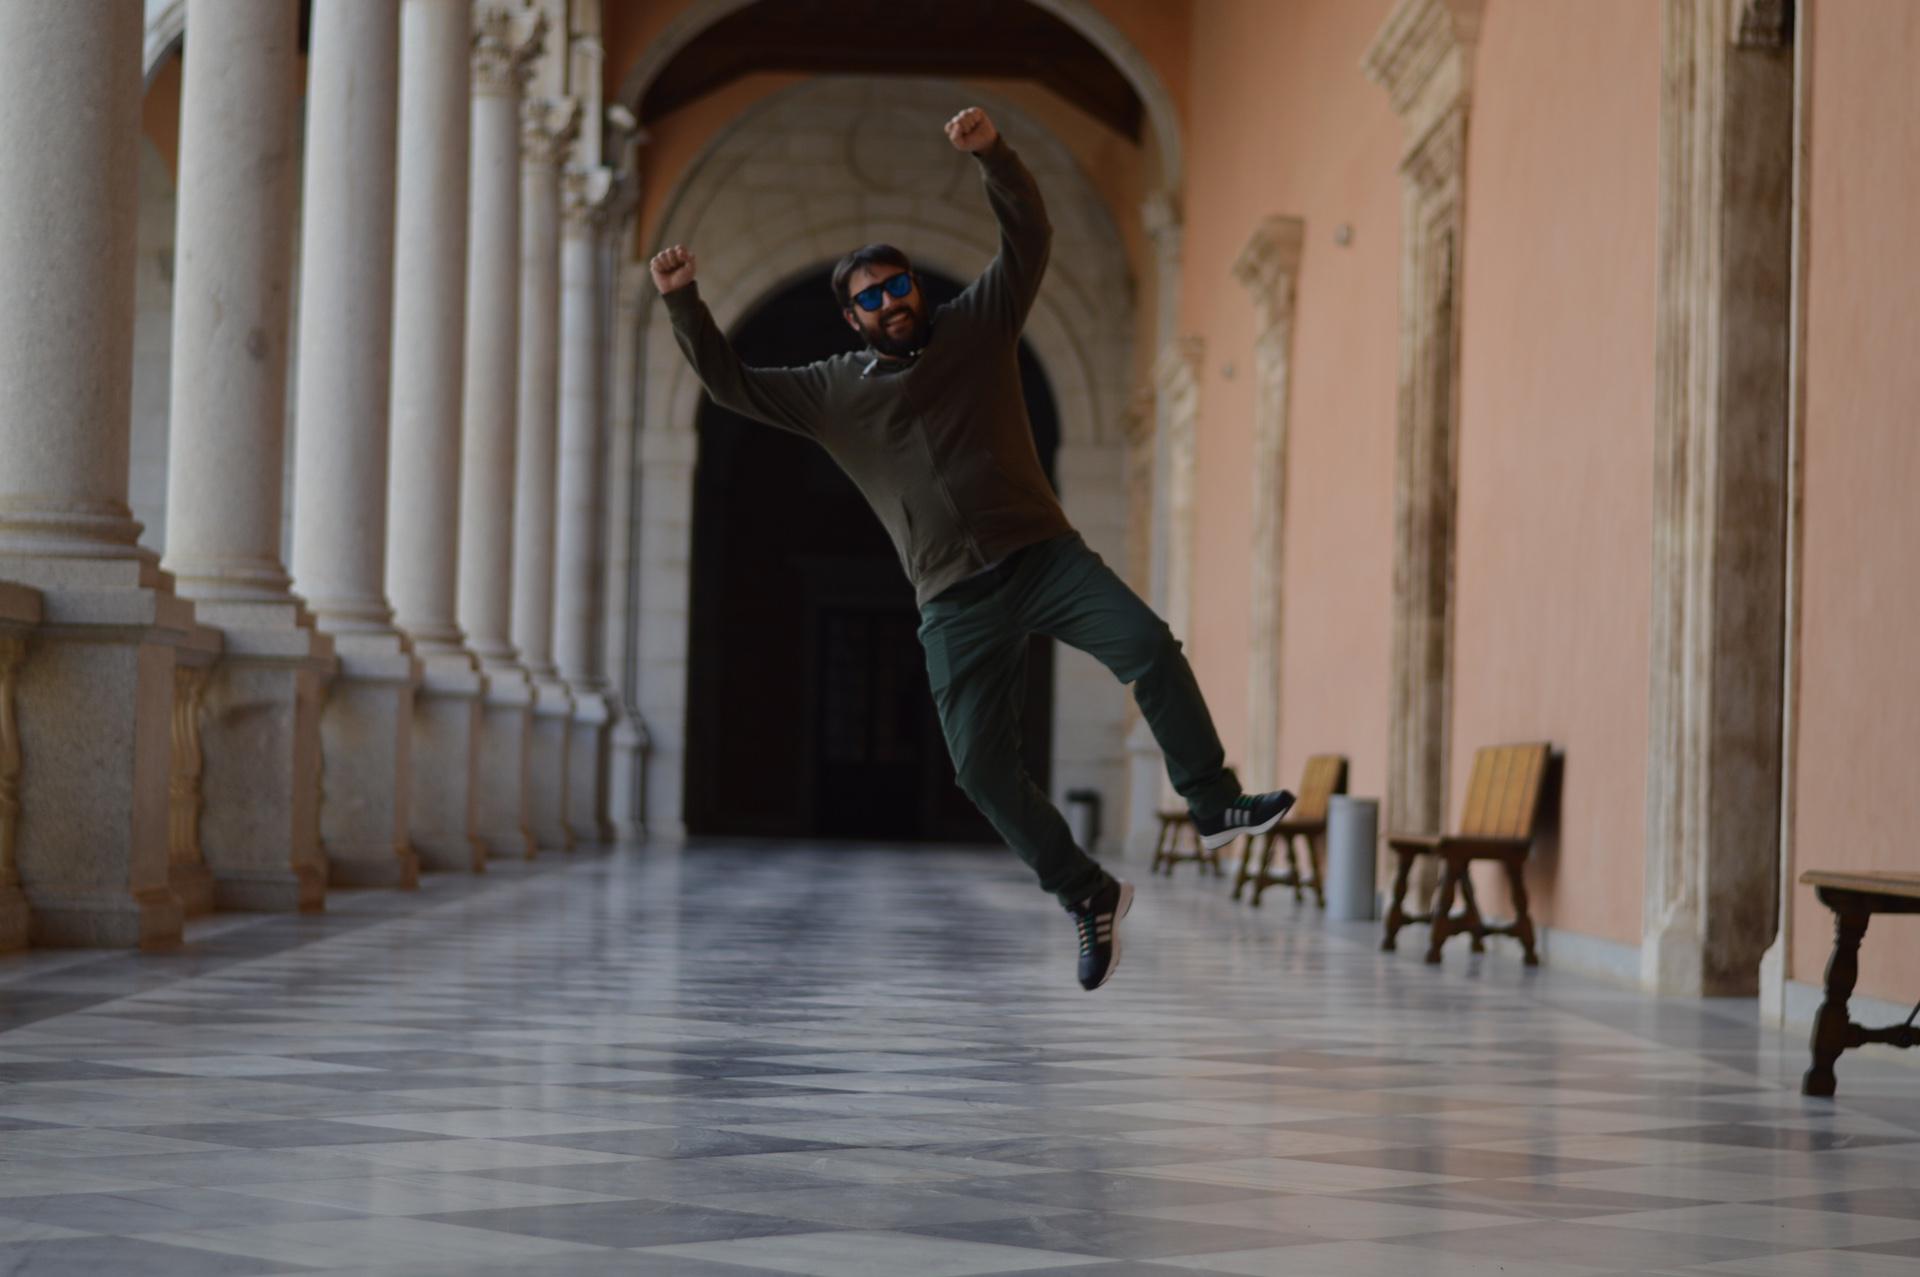 El famoso salto de Carballo